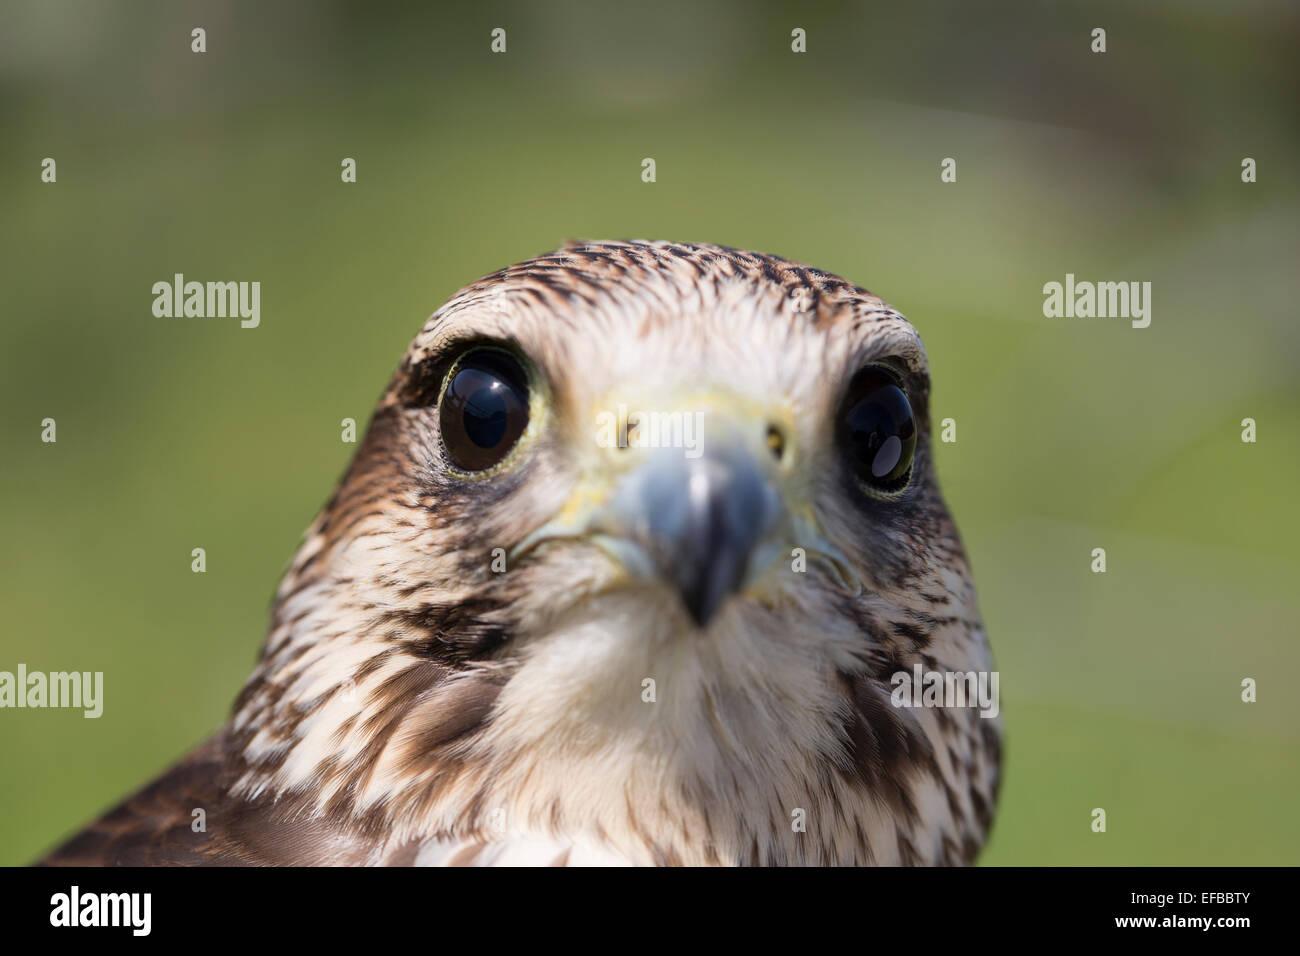 Wildlife : European Kestrel (Falco tinnunculus), bird of prey. Aka Eurasian Kestrel or Old World Kestrel. - Stock Image